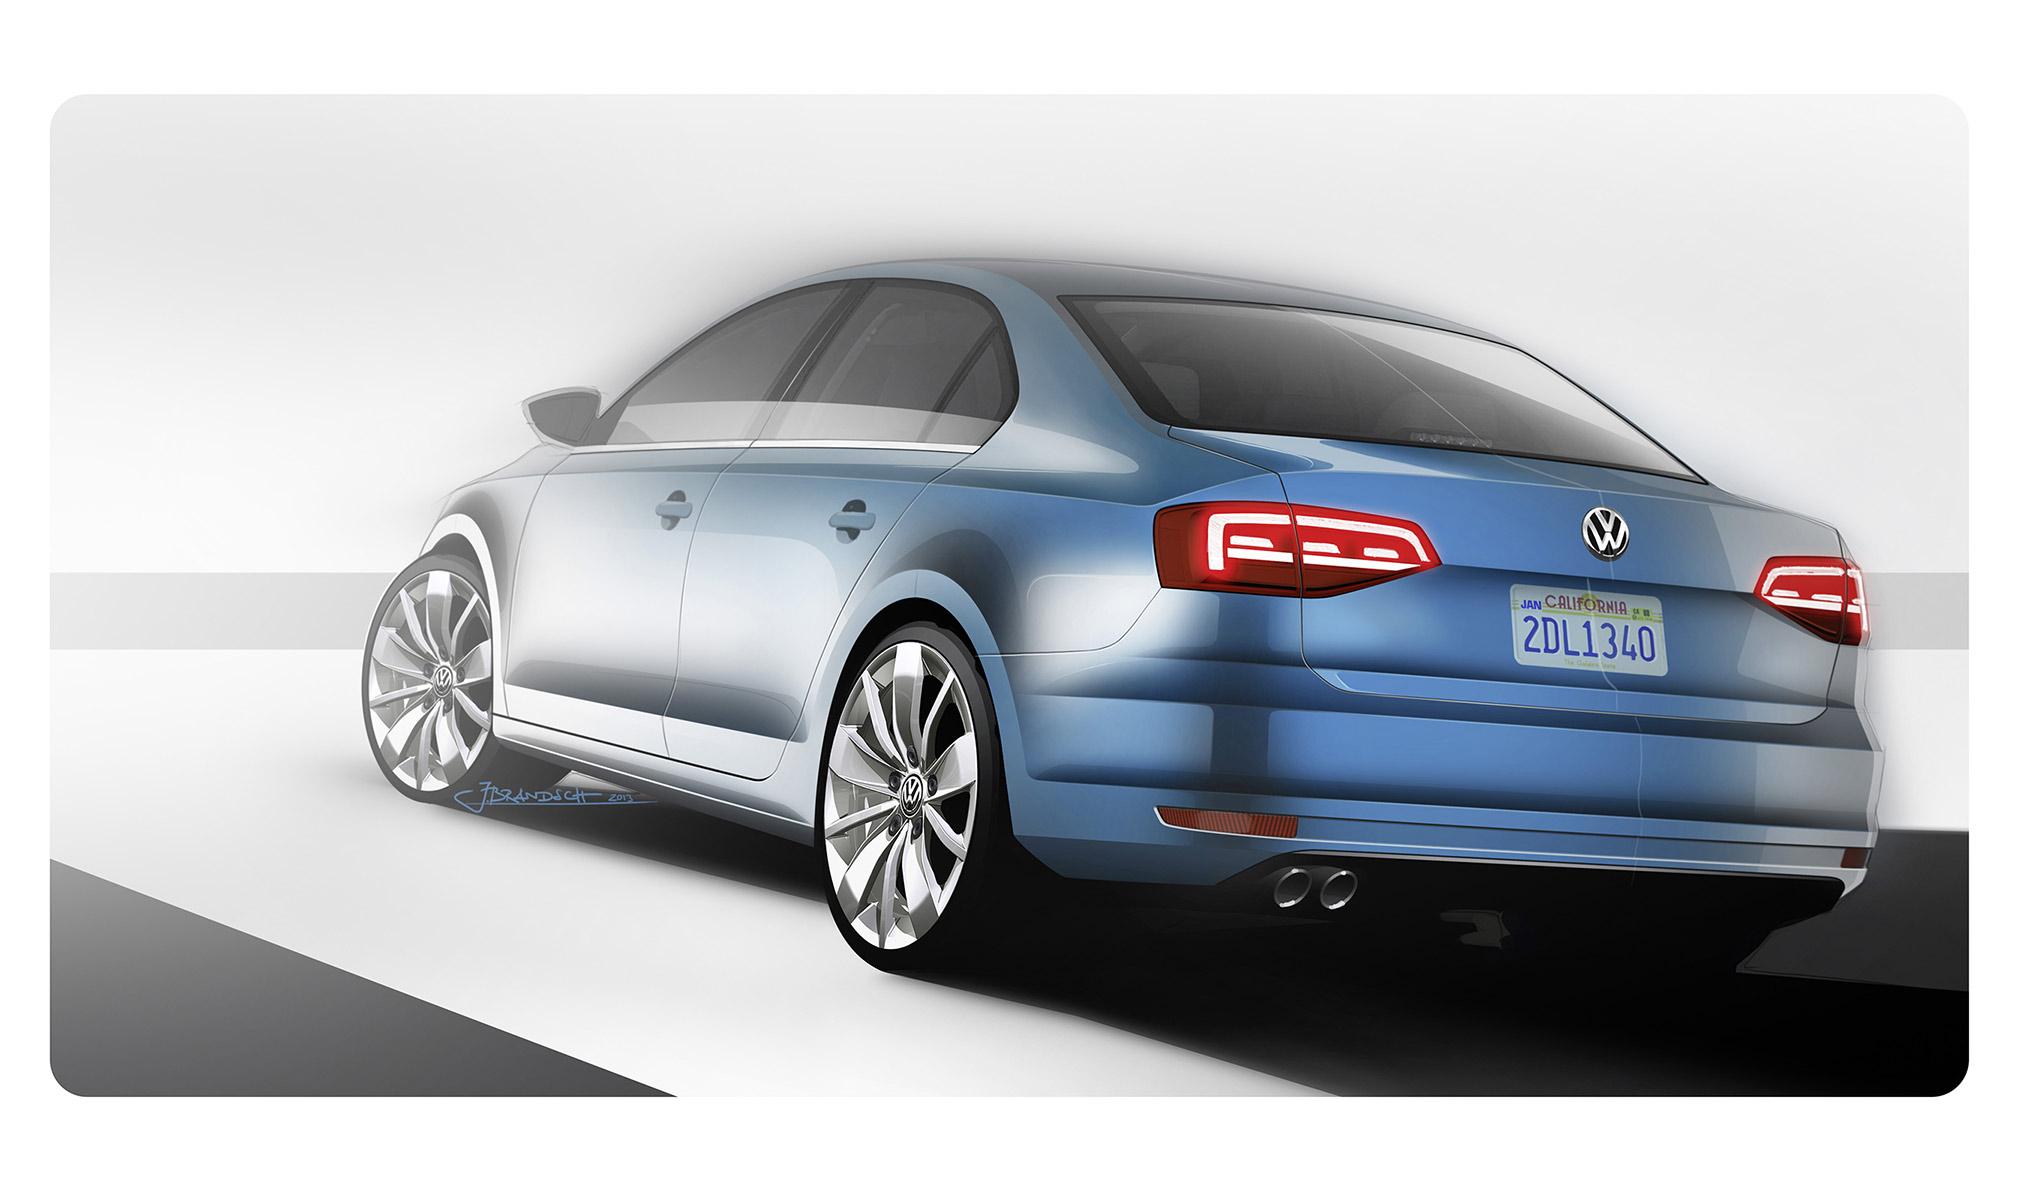 Audi S3 Sedan with Vossen CVT Wheels (photo: Vossen Japan)